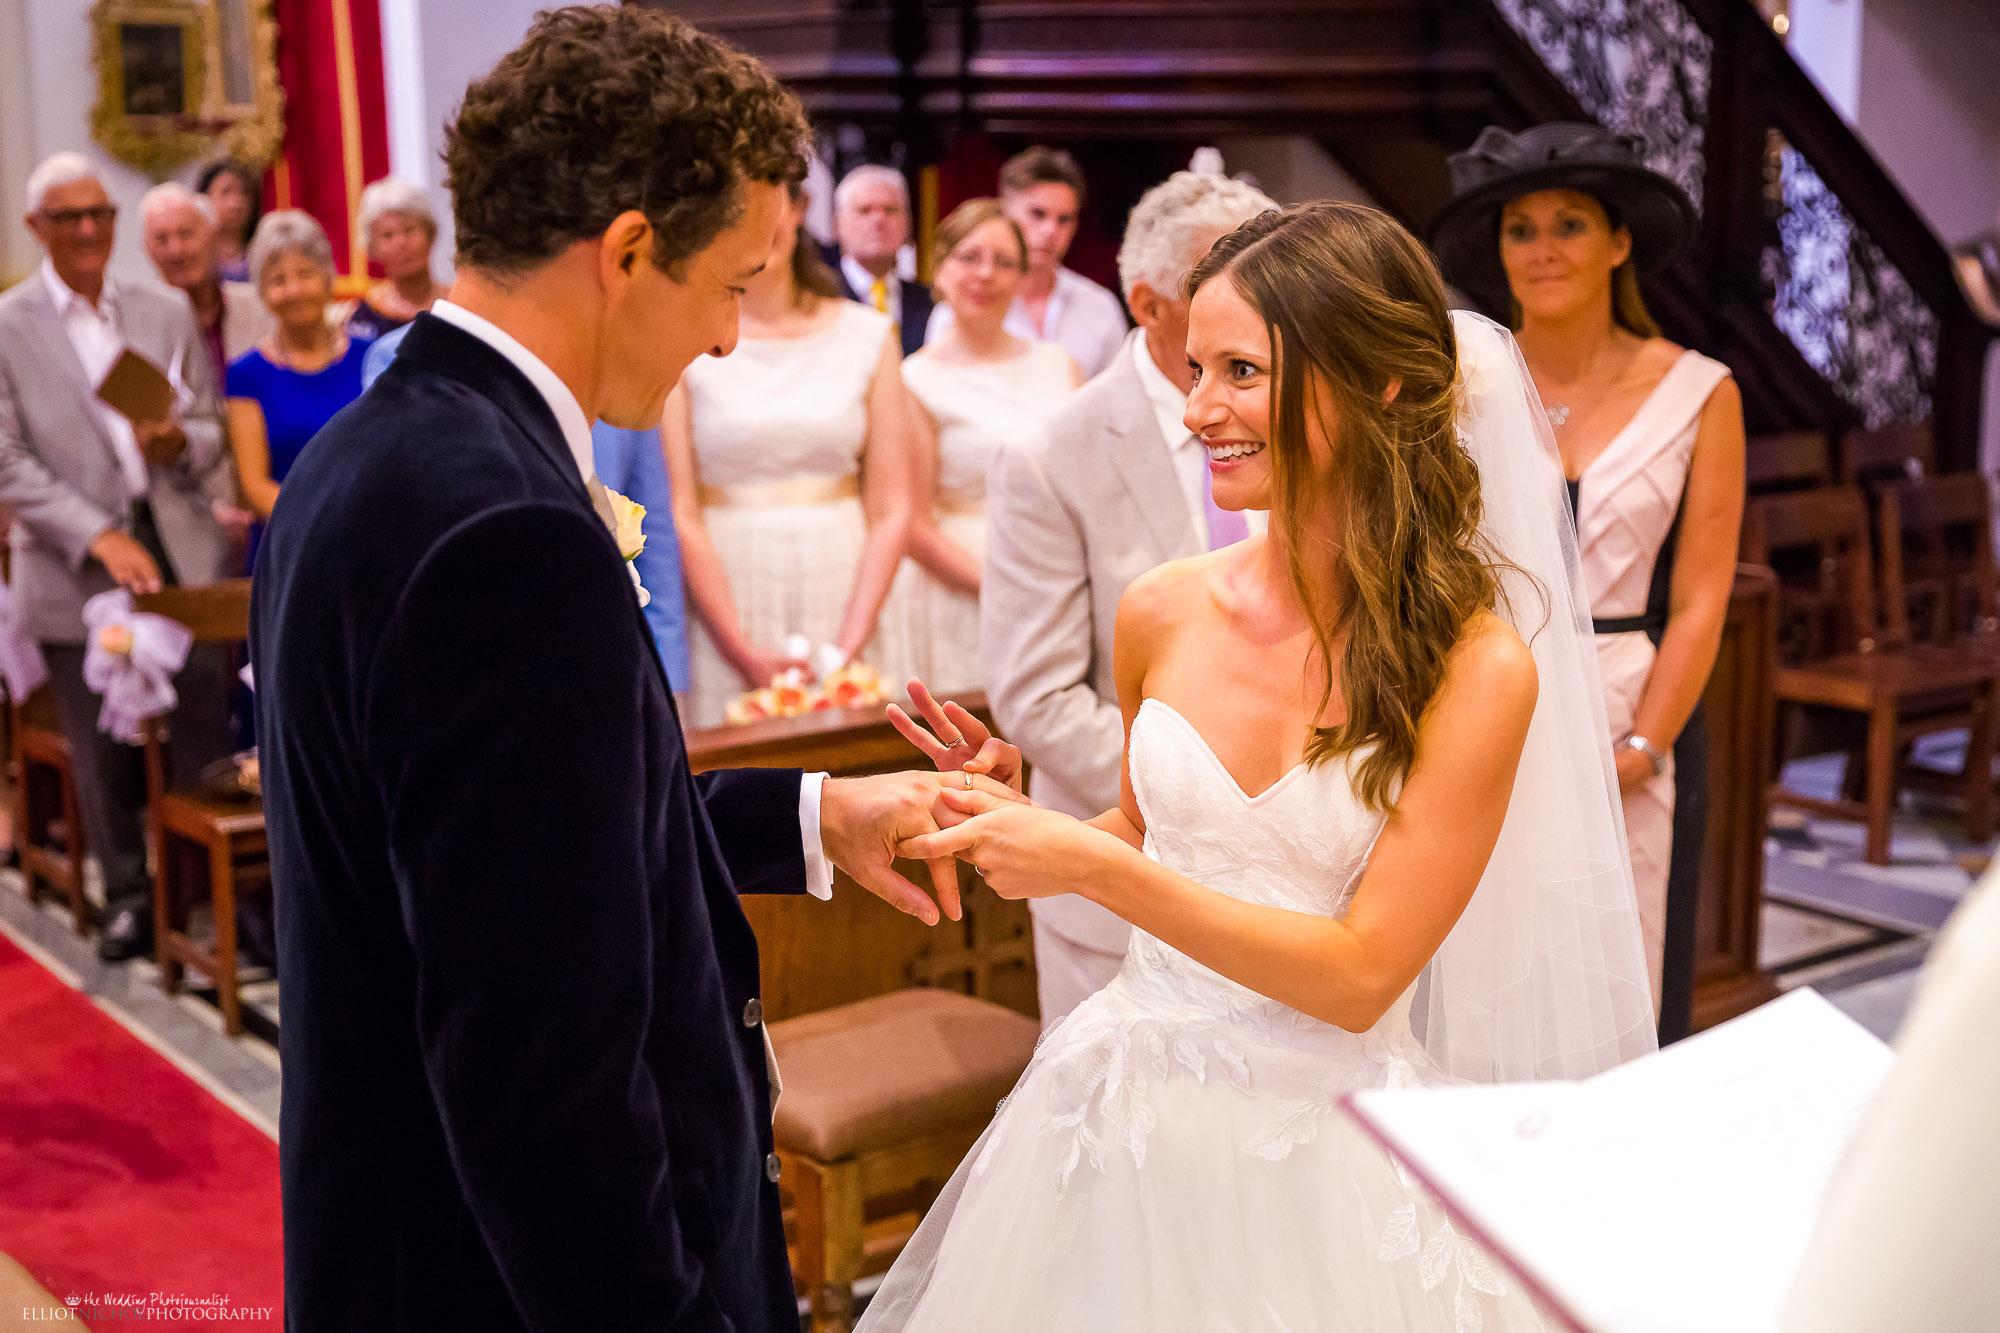 wedding-ring-ceremony-exchange-bride-groom-Northeast-photographer